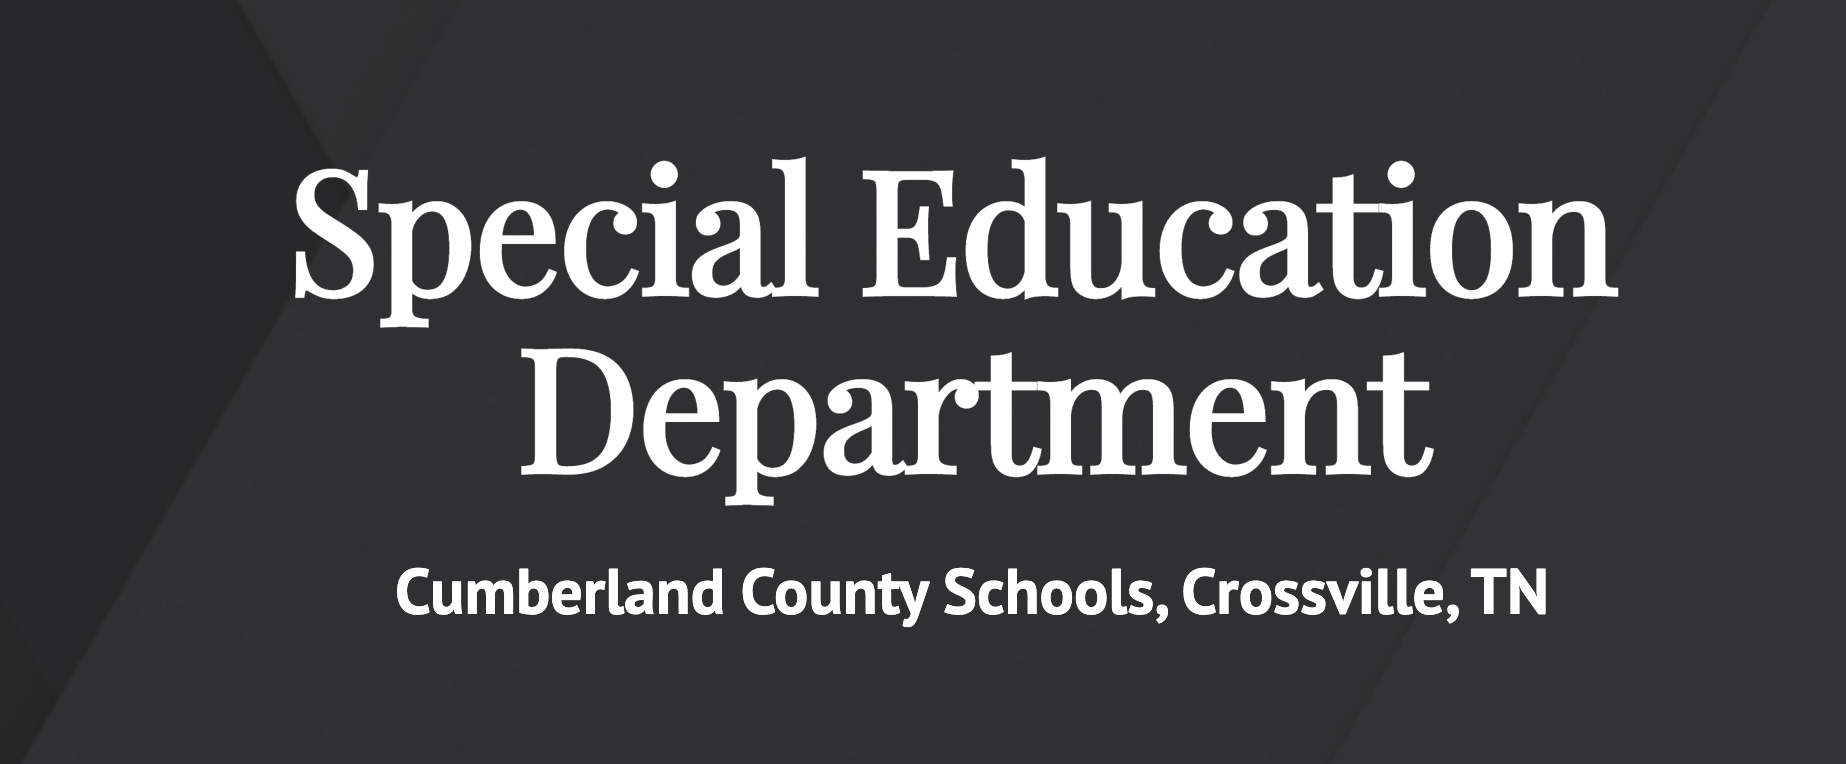 Special Education Website